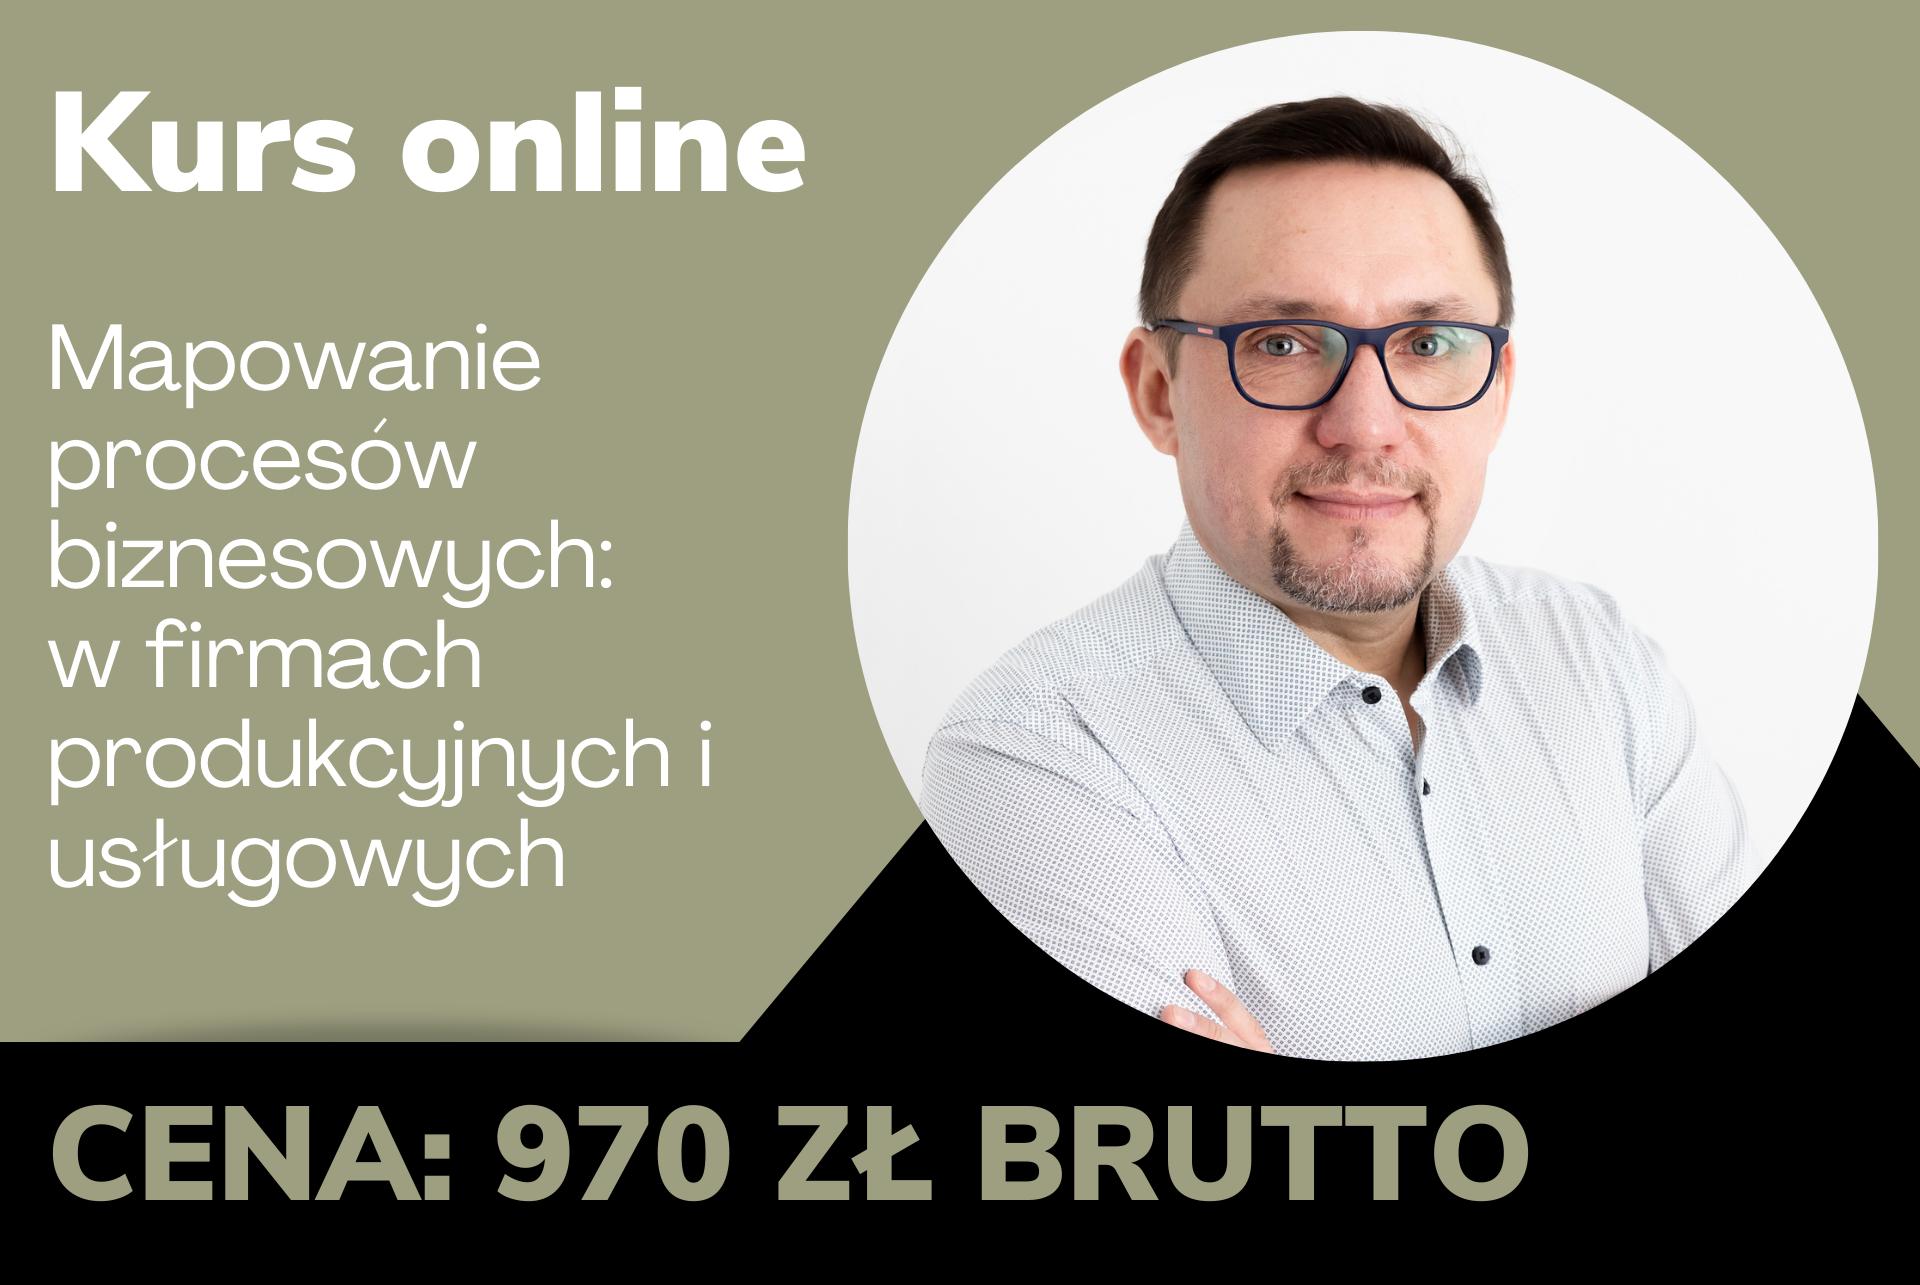 https://primlean.pl/wp-content/uploads/2021/02/Kurs-online-2.png